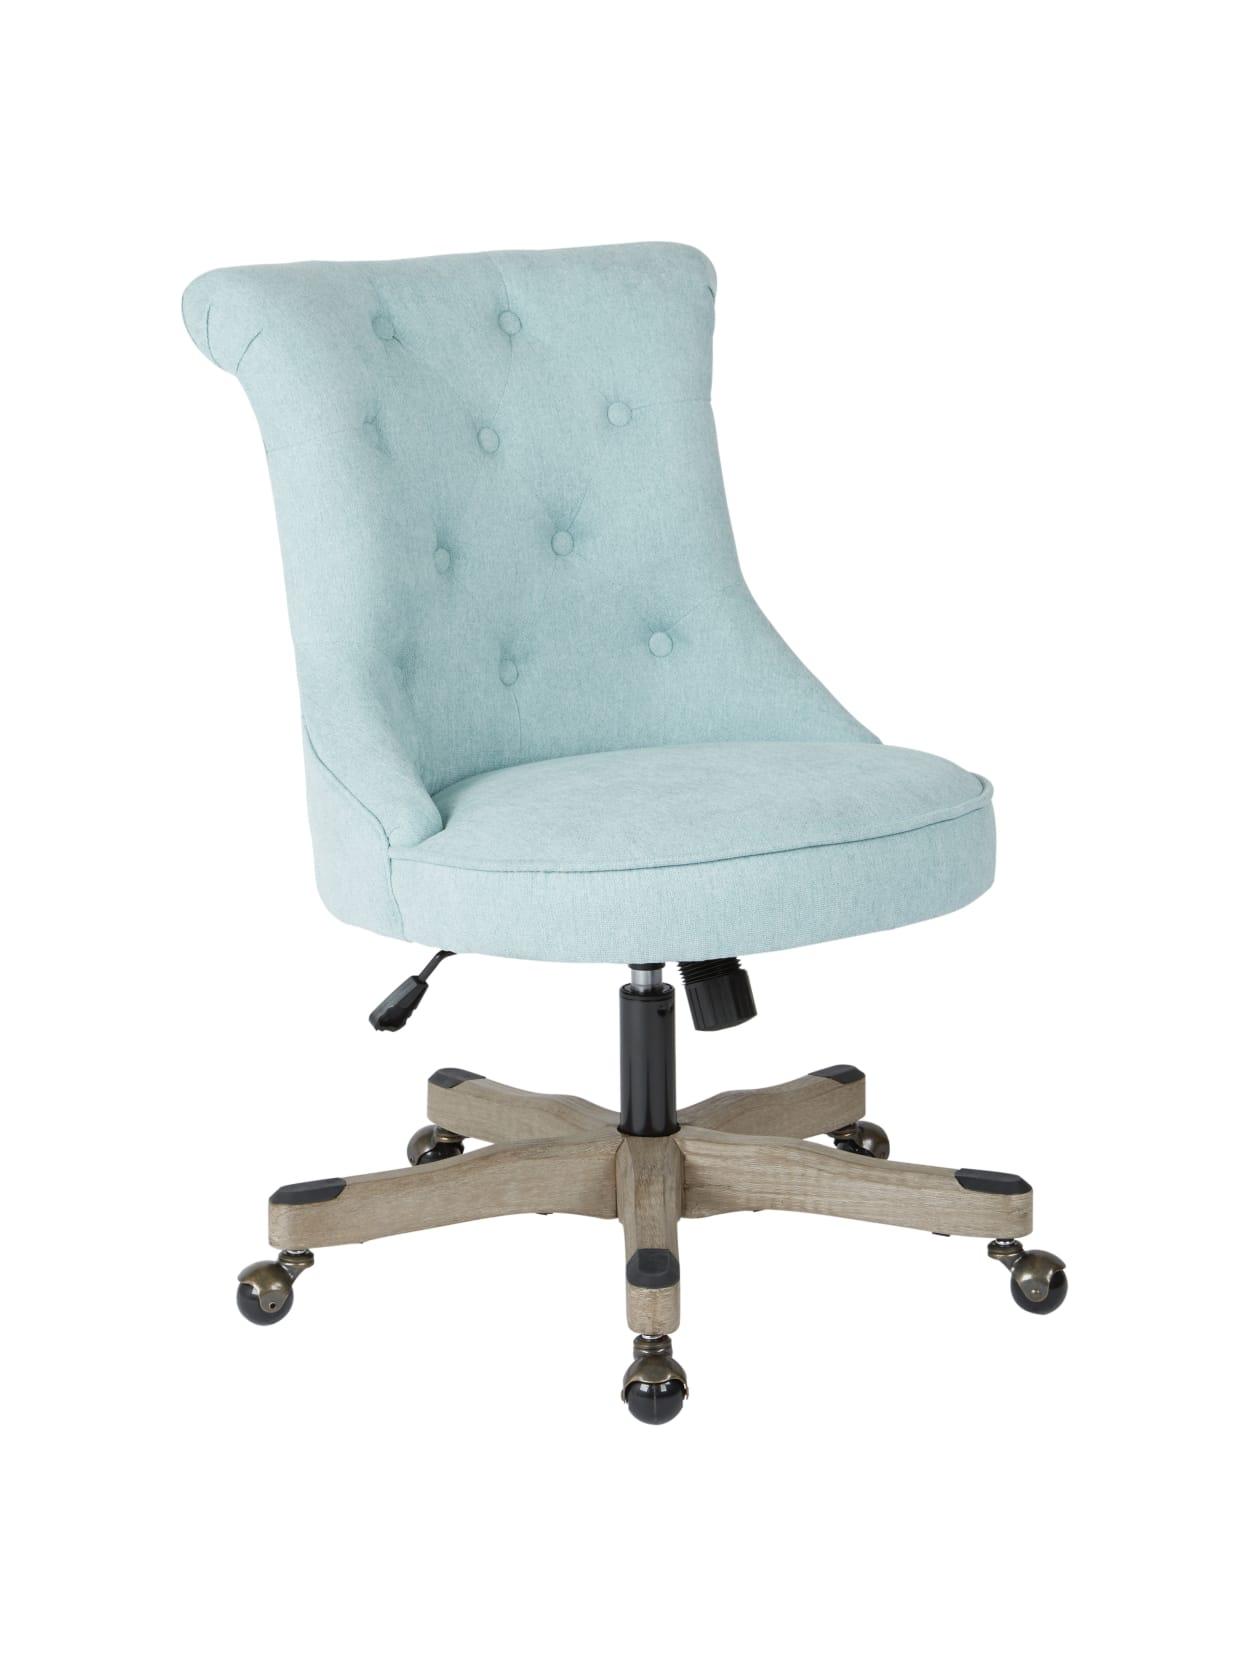 Office Star Hannah Tufted Office Chair MintGray - Office Depot